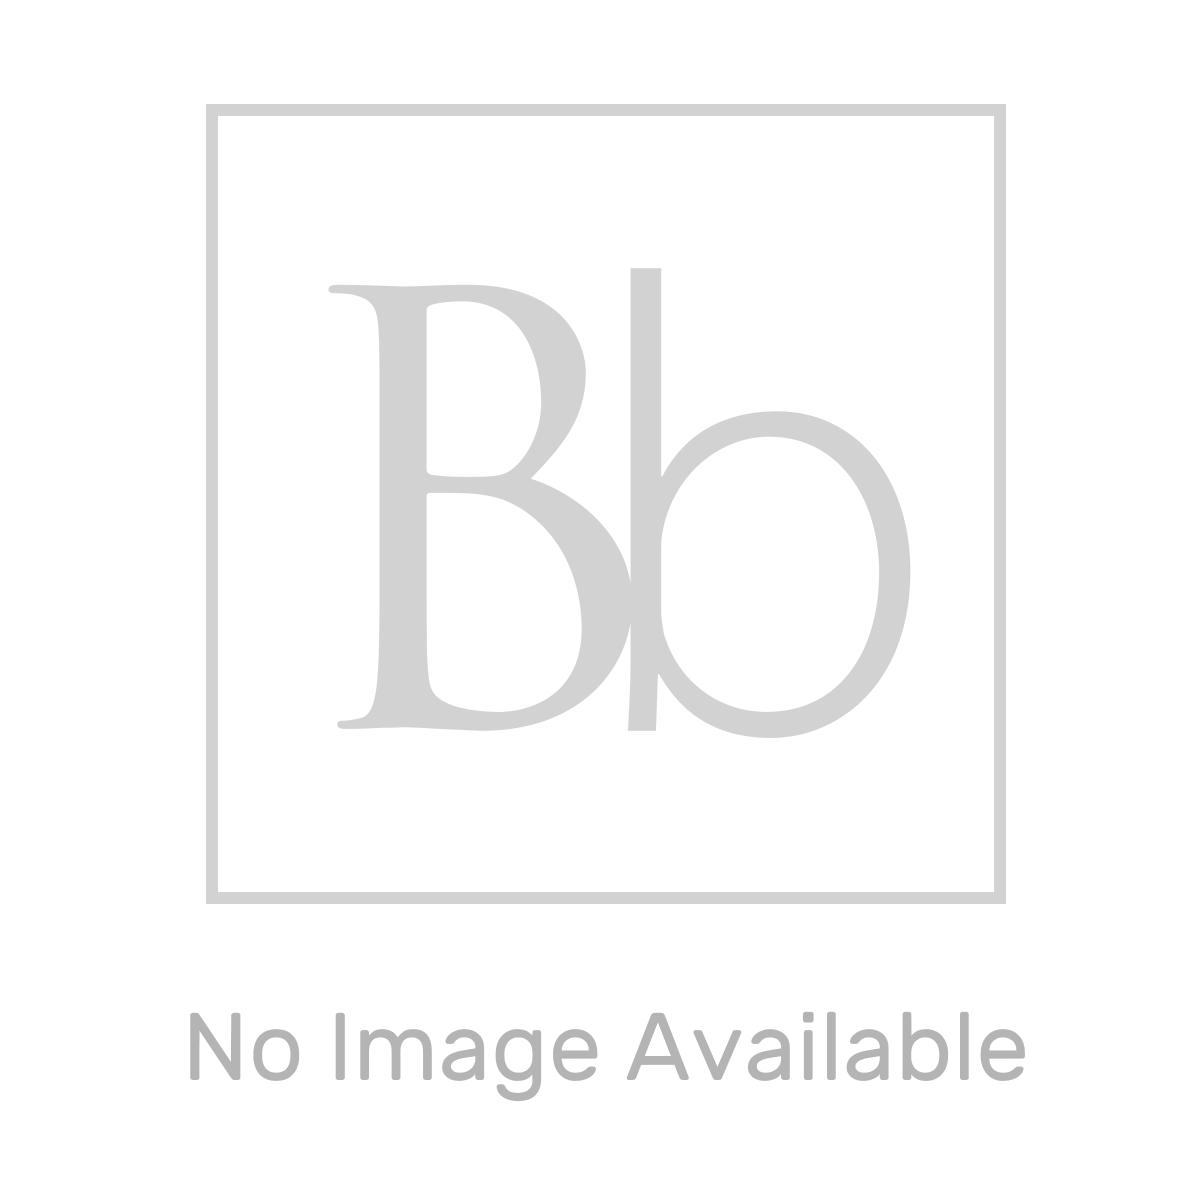 Aquadart Venturi 6 4 Fold Bath Shower Screen Dimensions